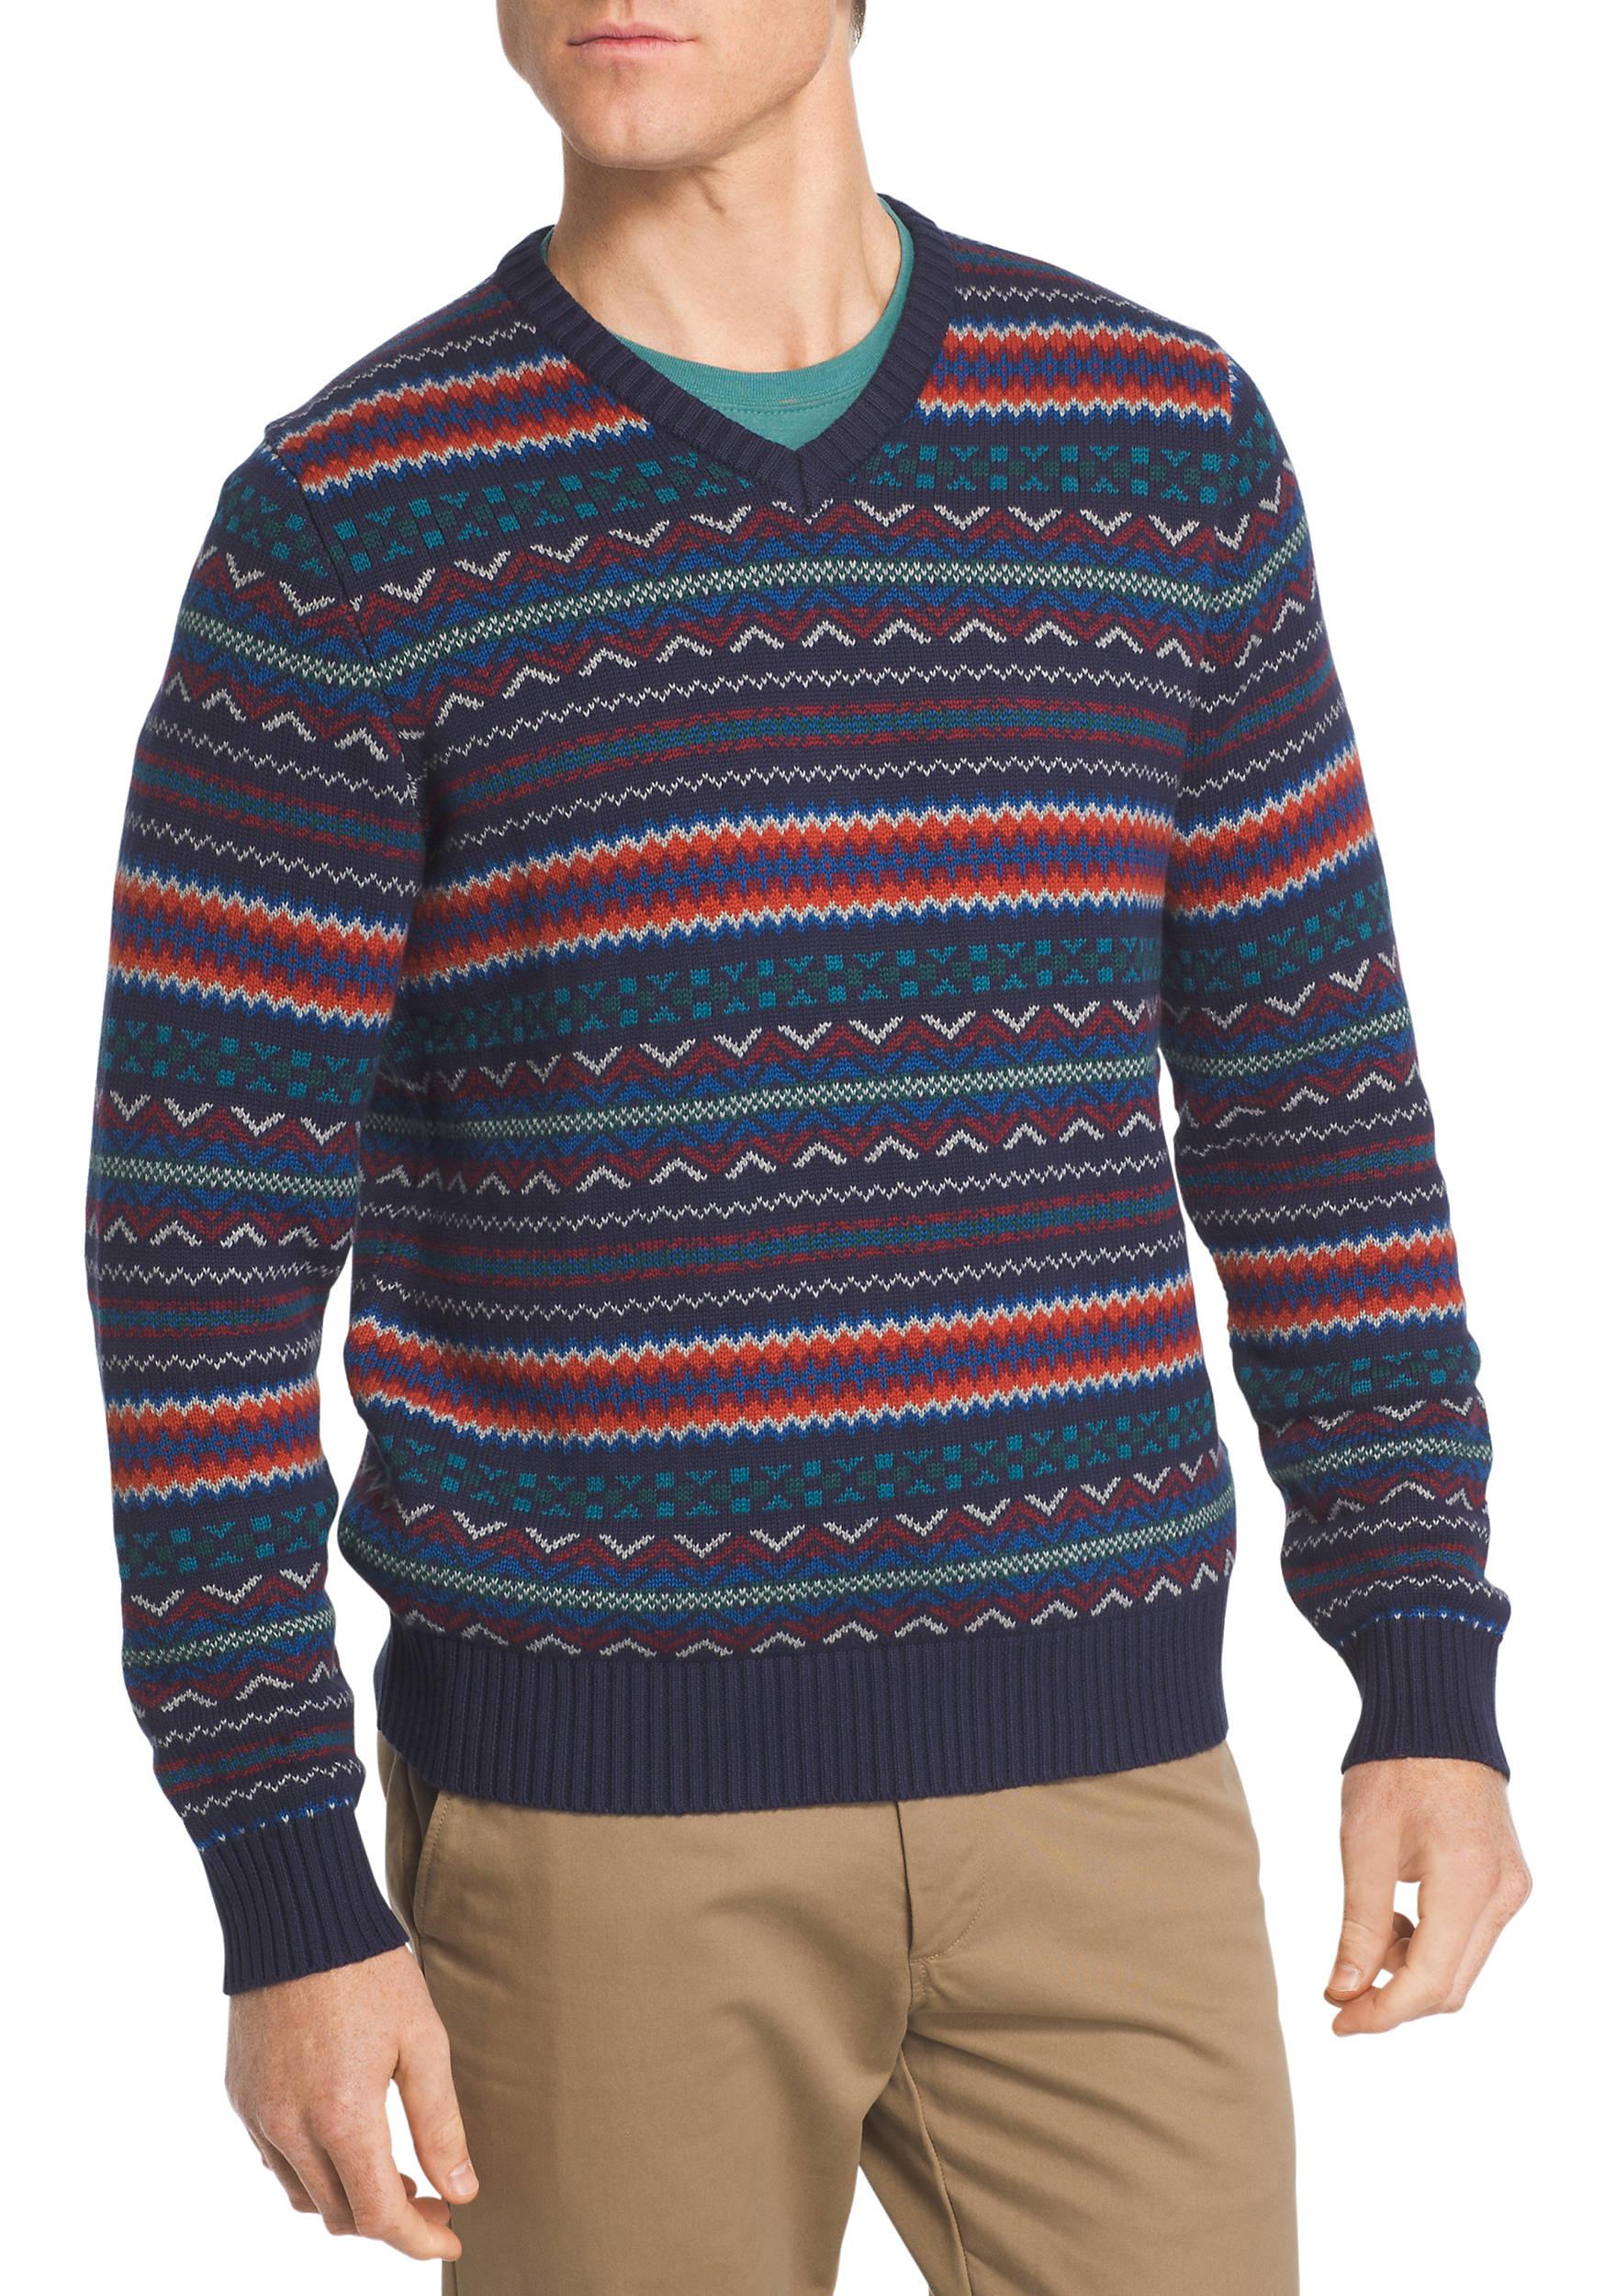 IZOD Fair Isle V-Neck Sweater | belk